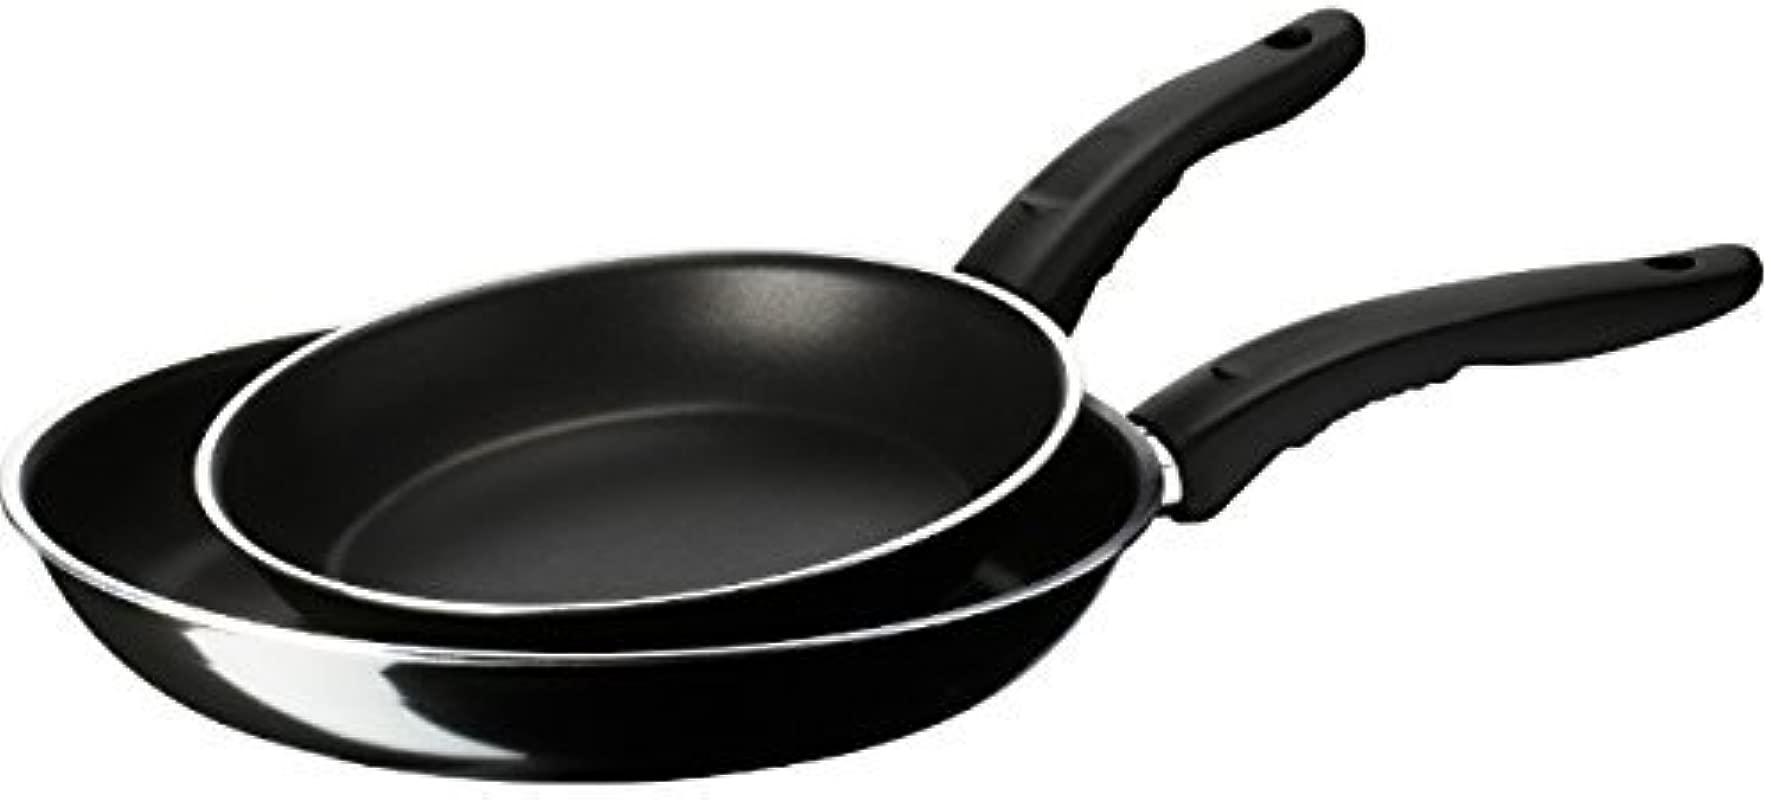 IKEA Black 2 Pan Set 9 Inch 11 Inch Kavalkad Non Stick Teflon